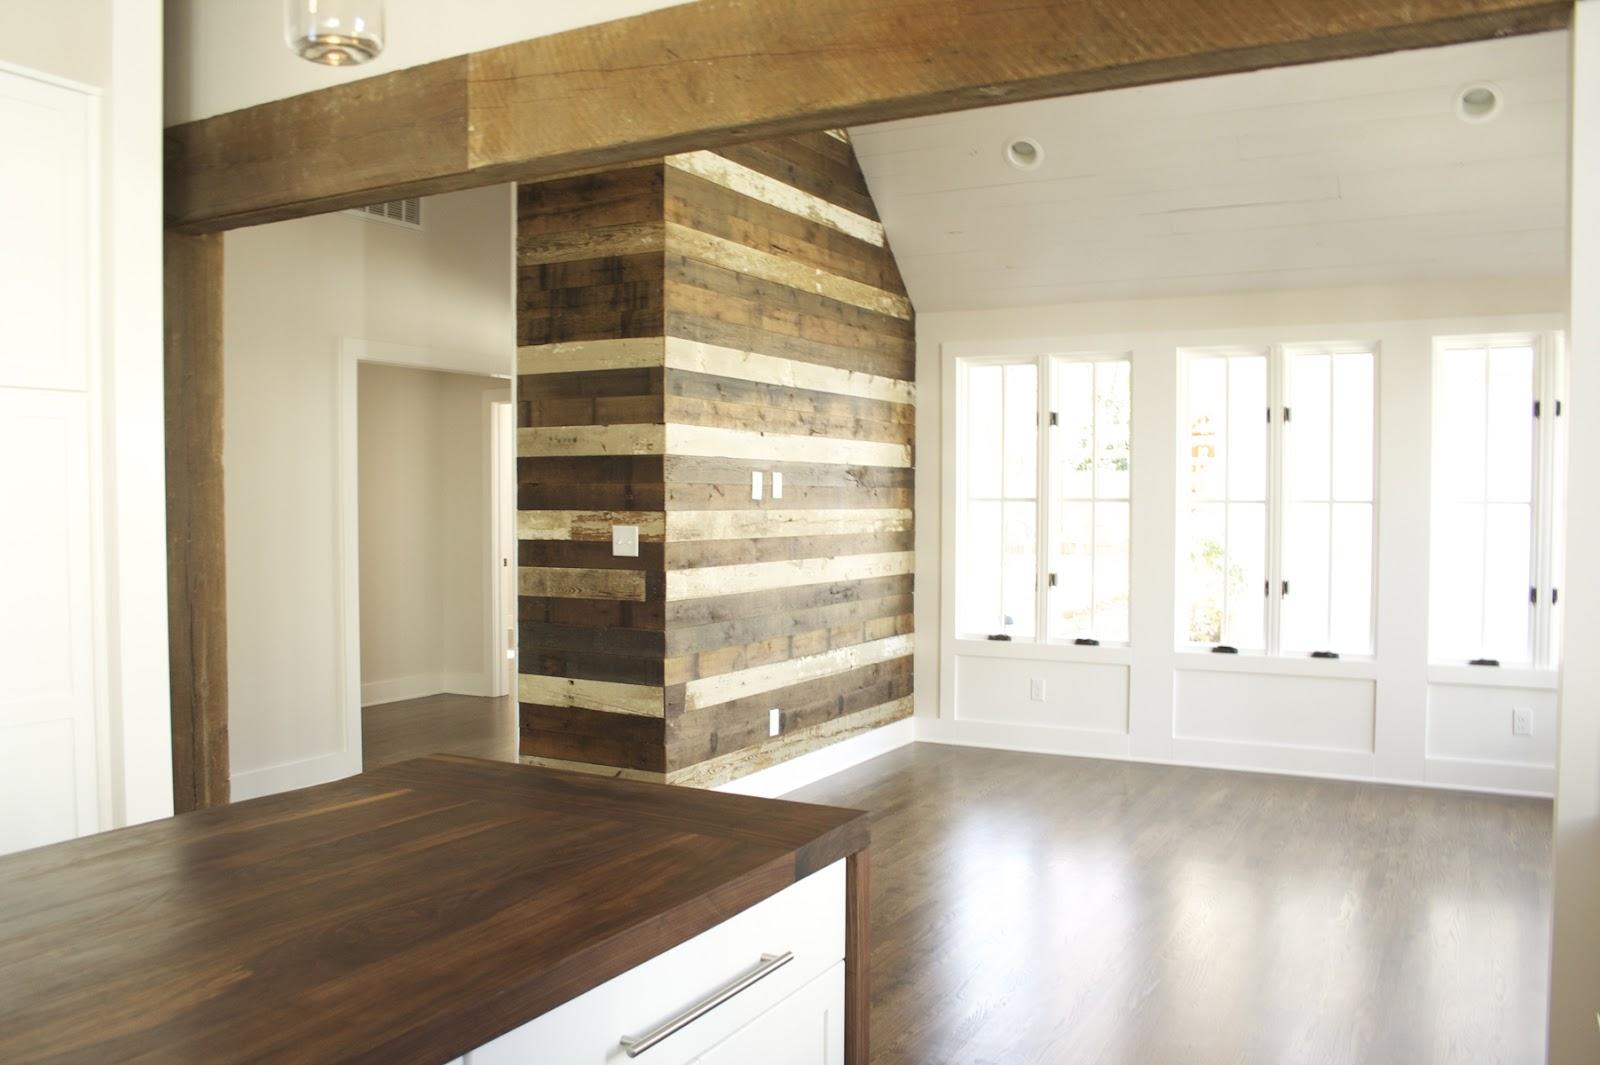 One Wall Kitchen Layout With Island - Kitchen Design Photos 2015